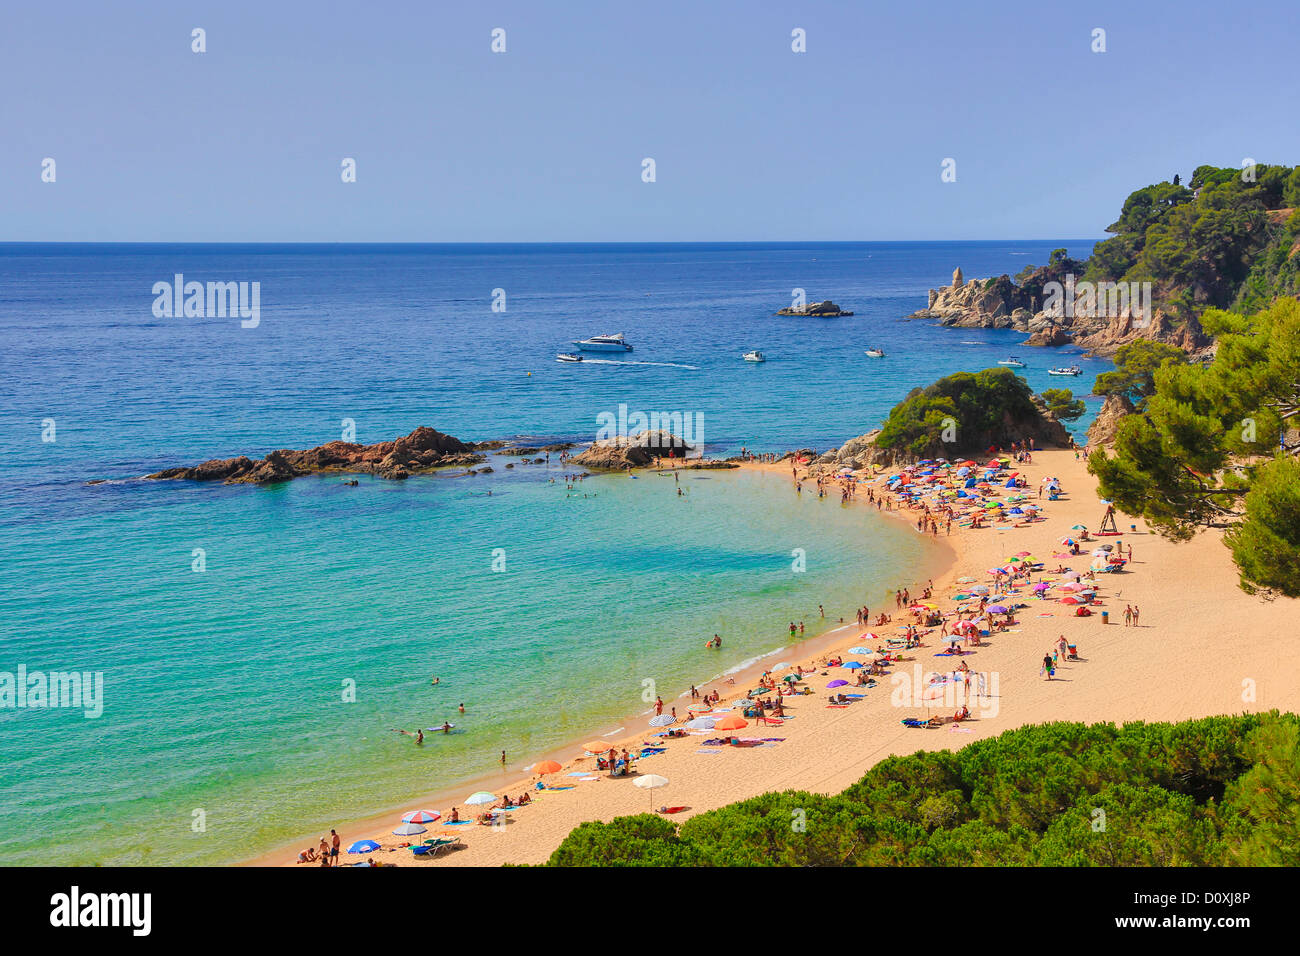 Spagna, Europa, Catalonia, Costa Brava Costa, Lloret de Mar, città Santa Cristina Beach, Lloret, Loret de Mar, Immagini Stock